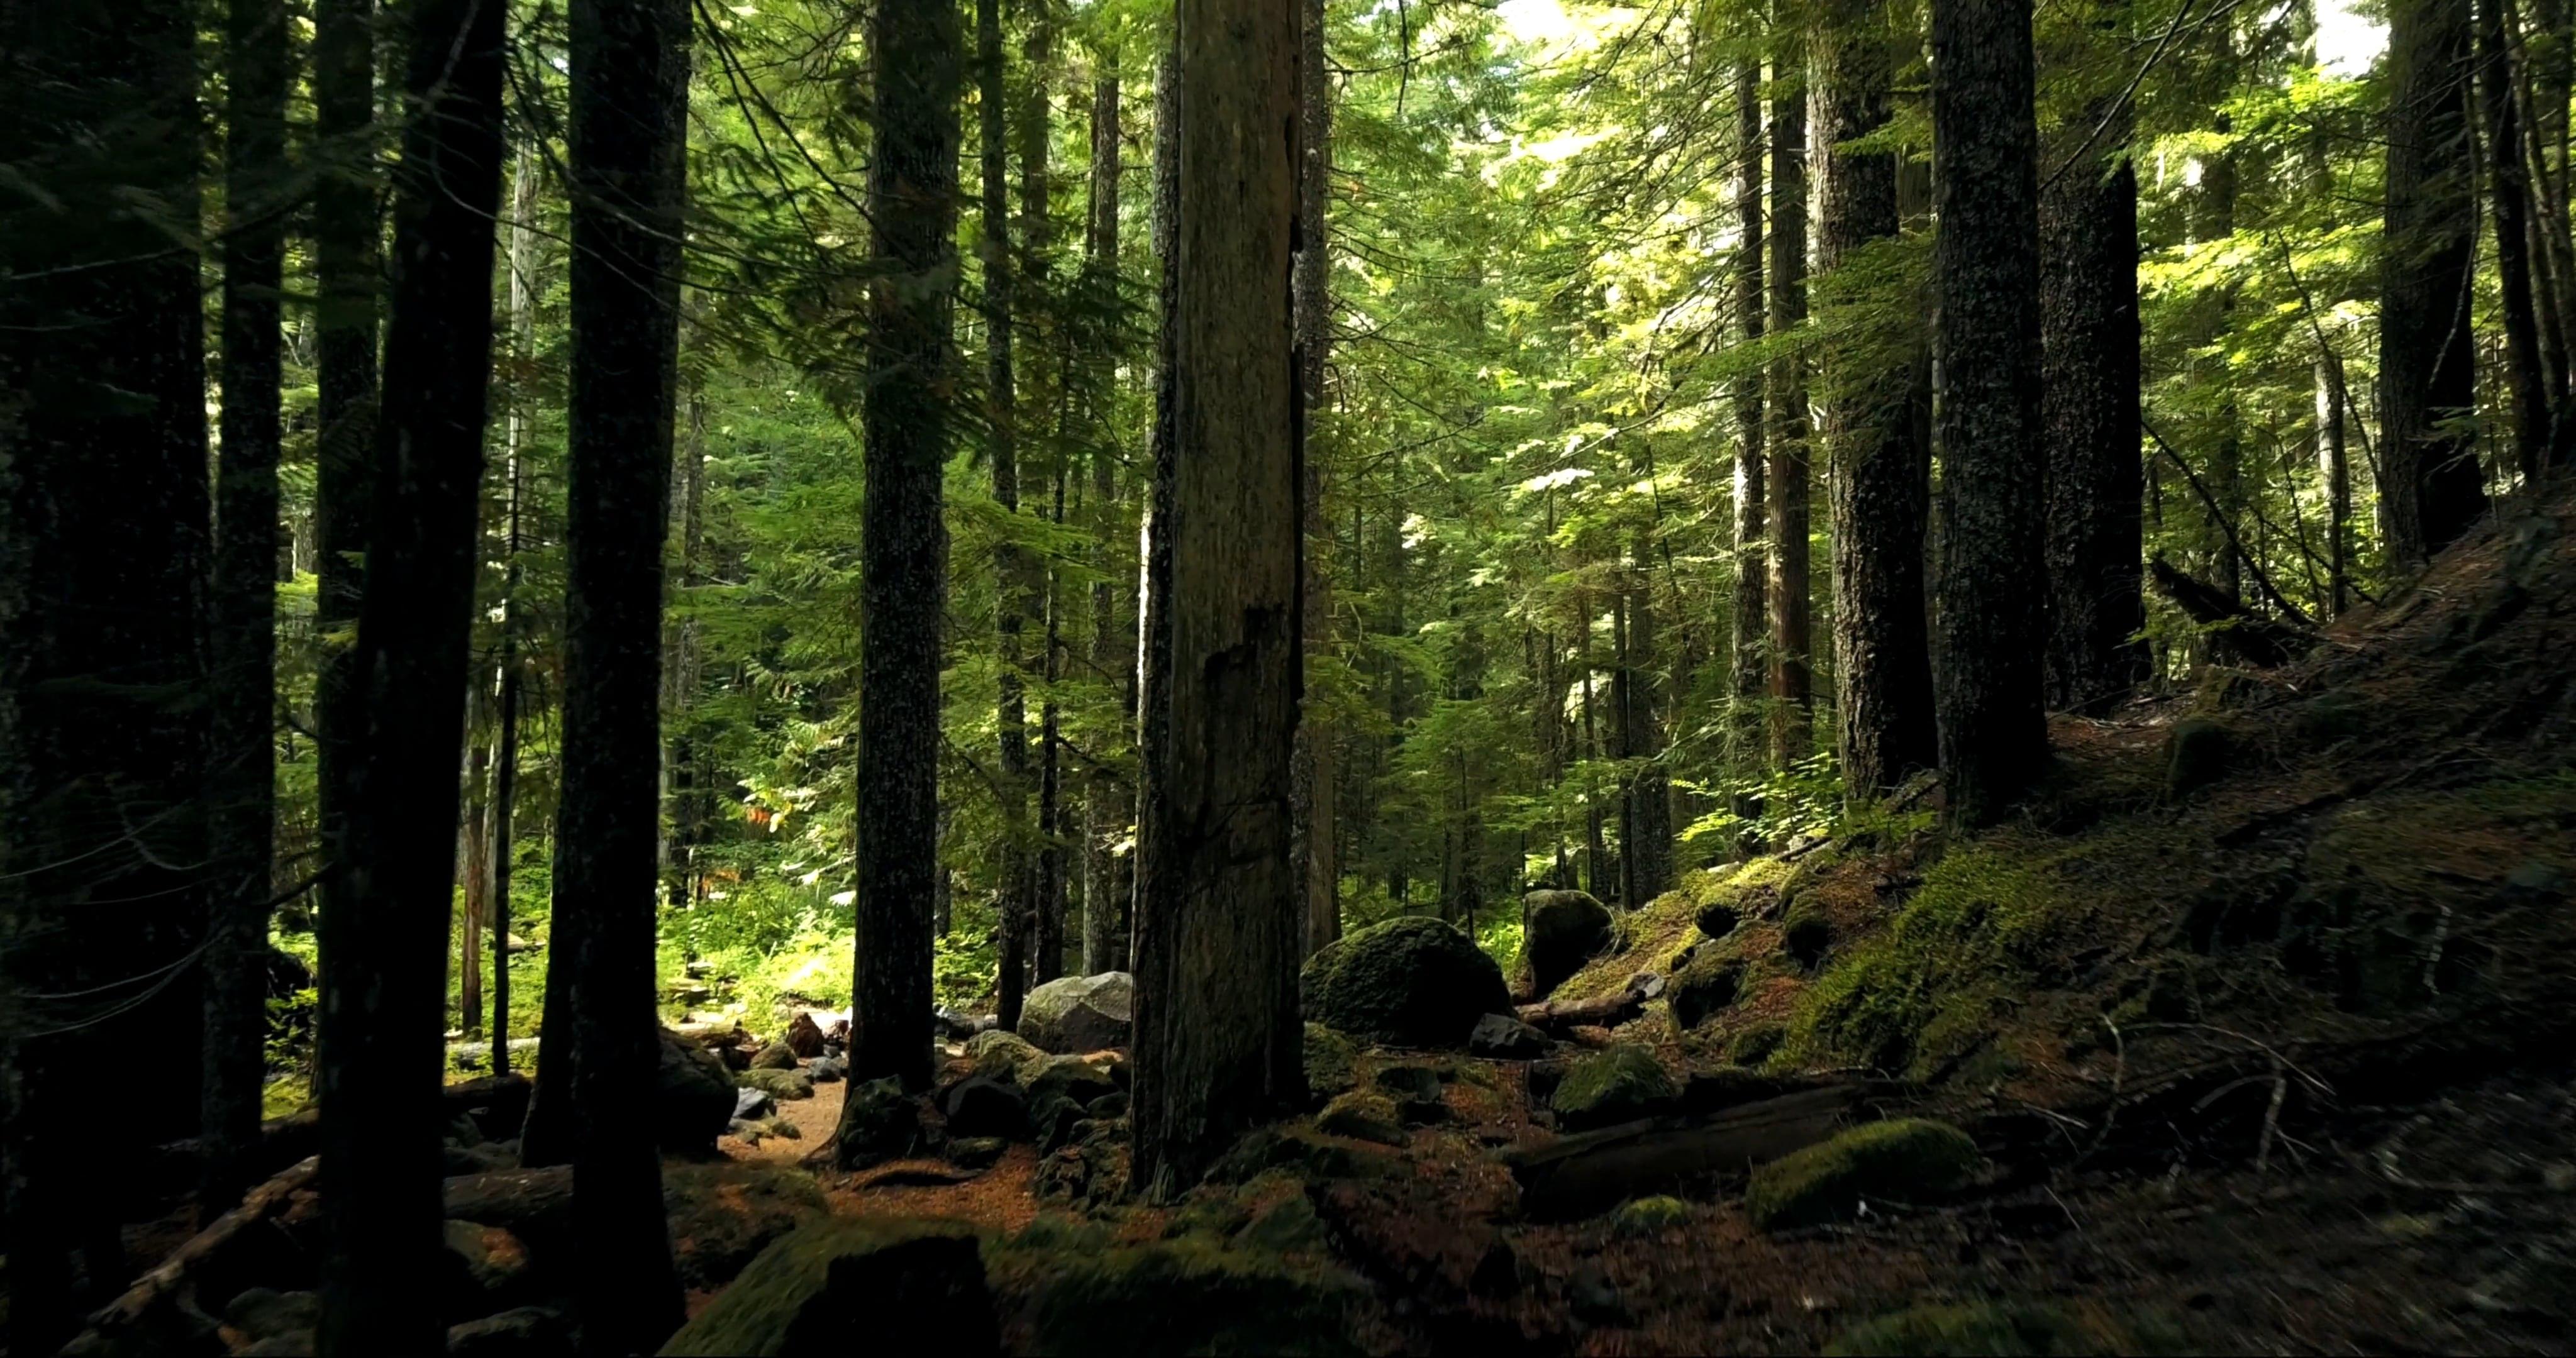 Free Nature Videos · Pexels